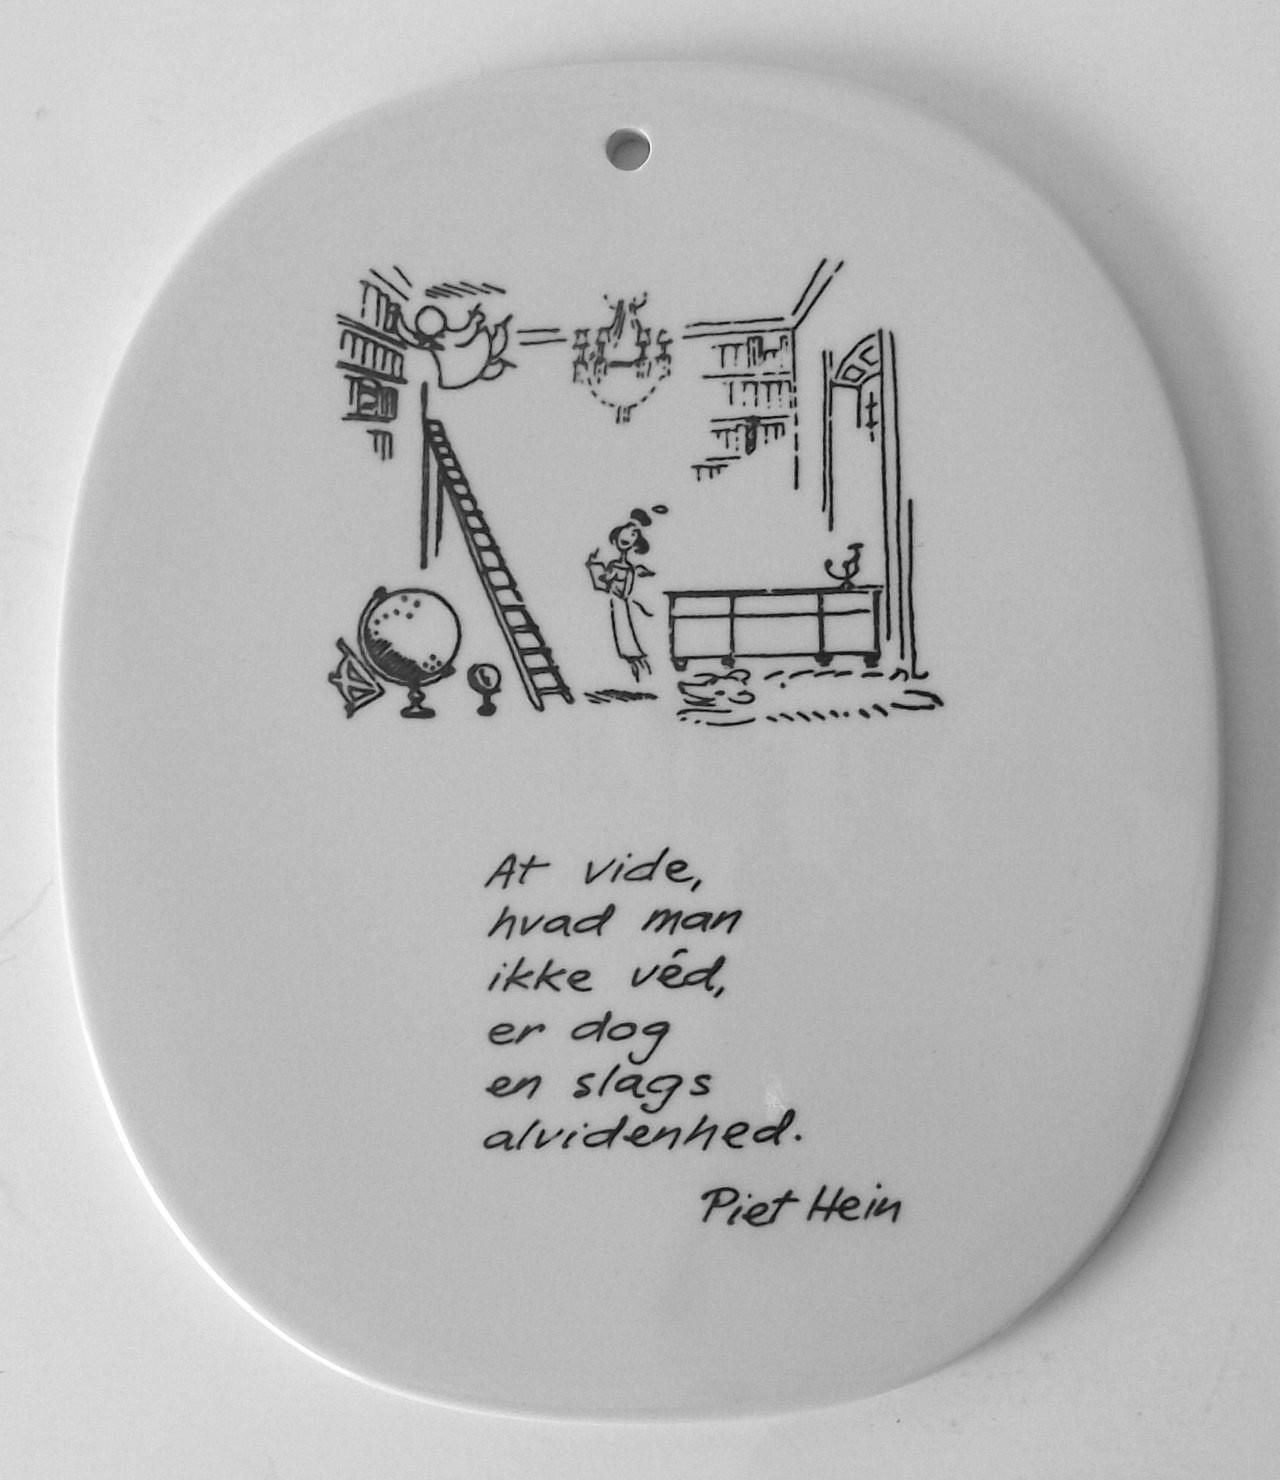 tænksomme citater Piet Hein: En slags alvidenhed < En sommerfugls selvmord tænksomme citater